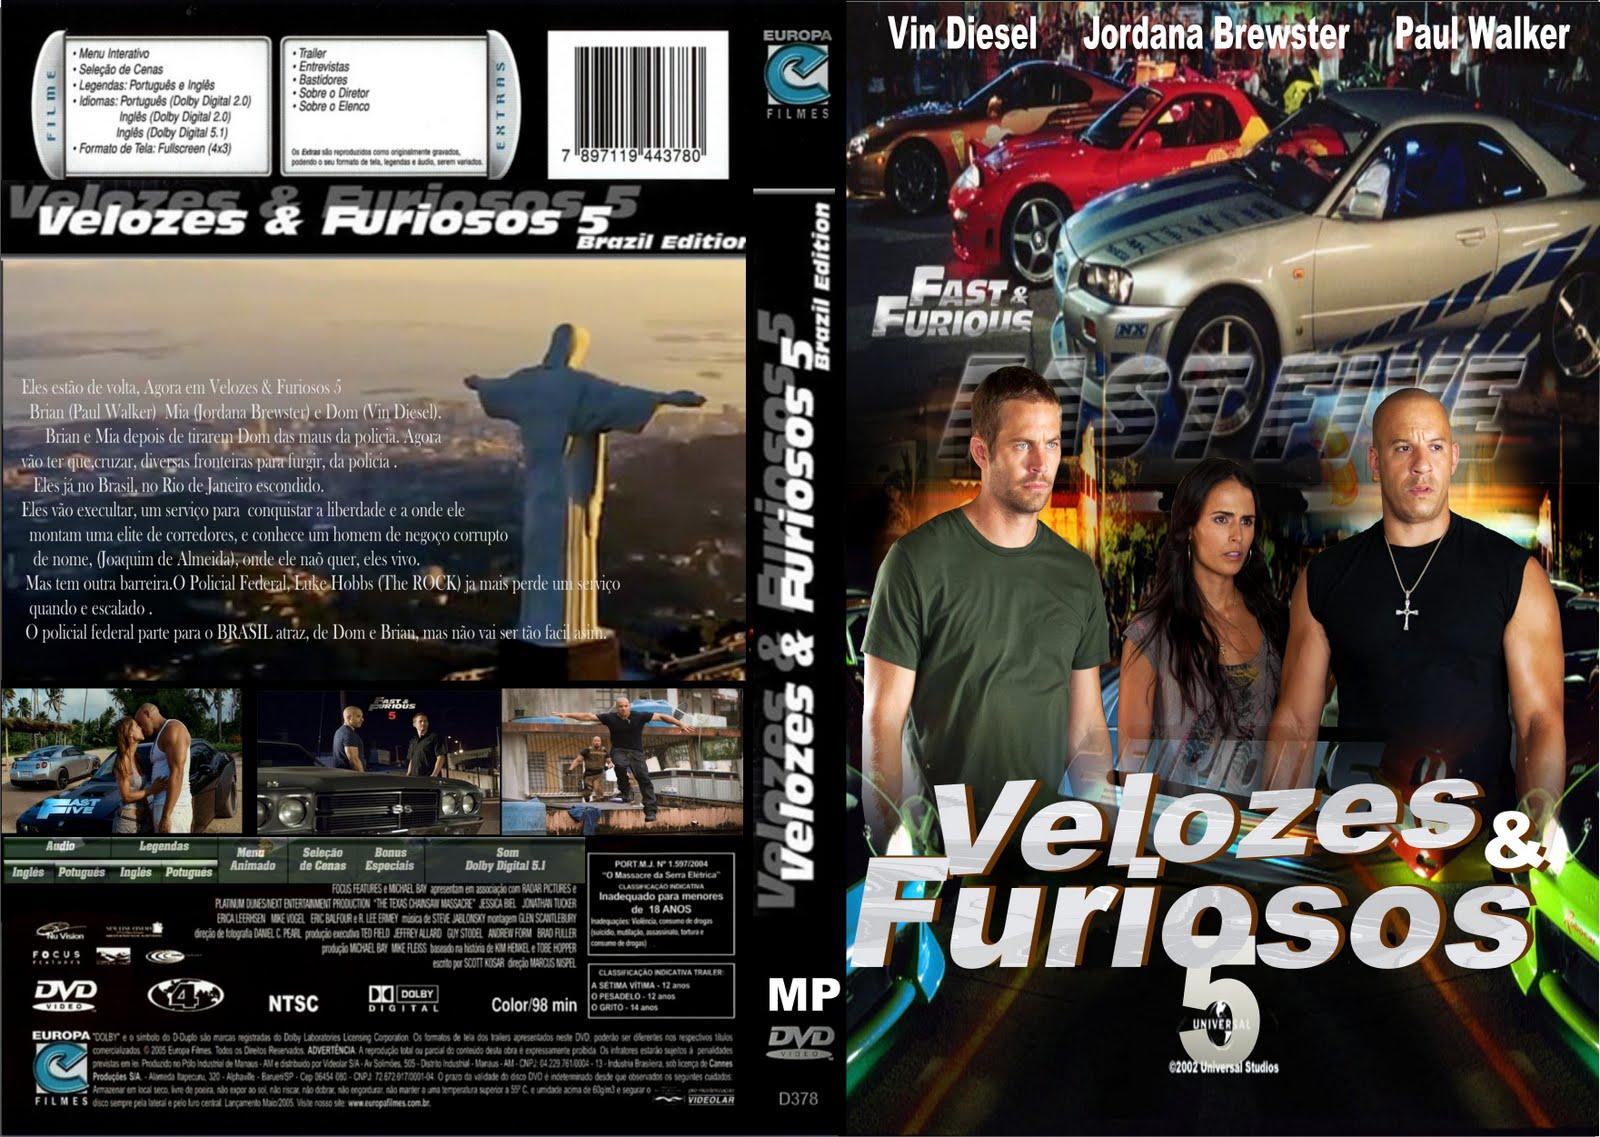 http://1.bp.blogspot.com/-MgDognSiE00/Tlf9LZZofGI/AAAAAAAACds/cf2EjwK7wG8/s1600/capa.Velozes_e_Furiosos_5.jpg